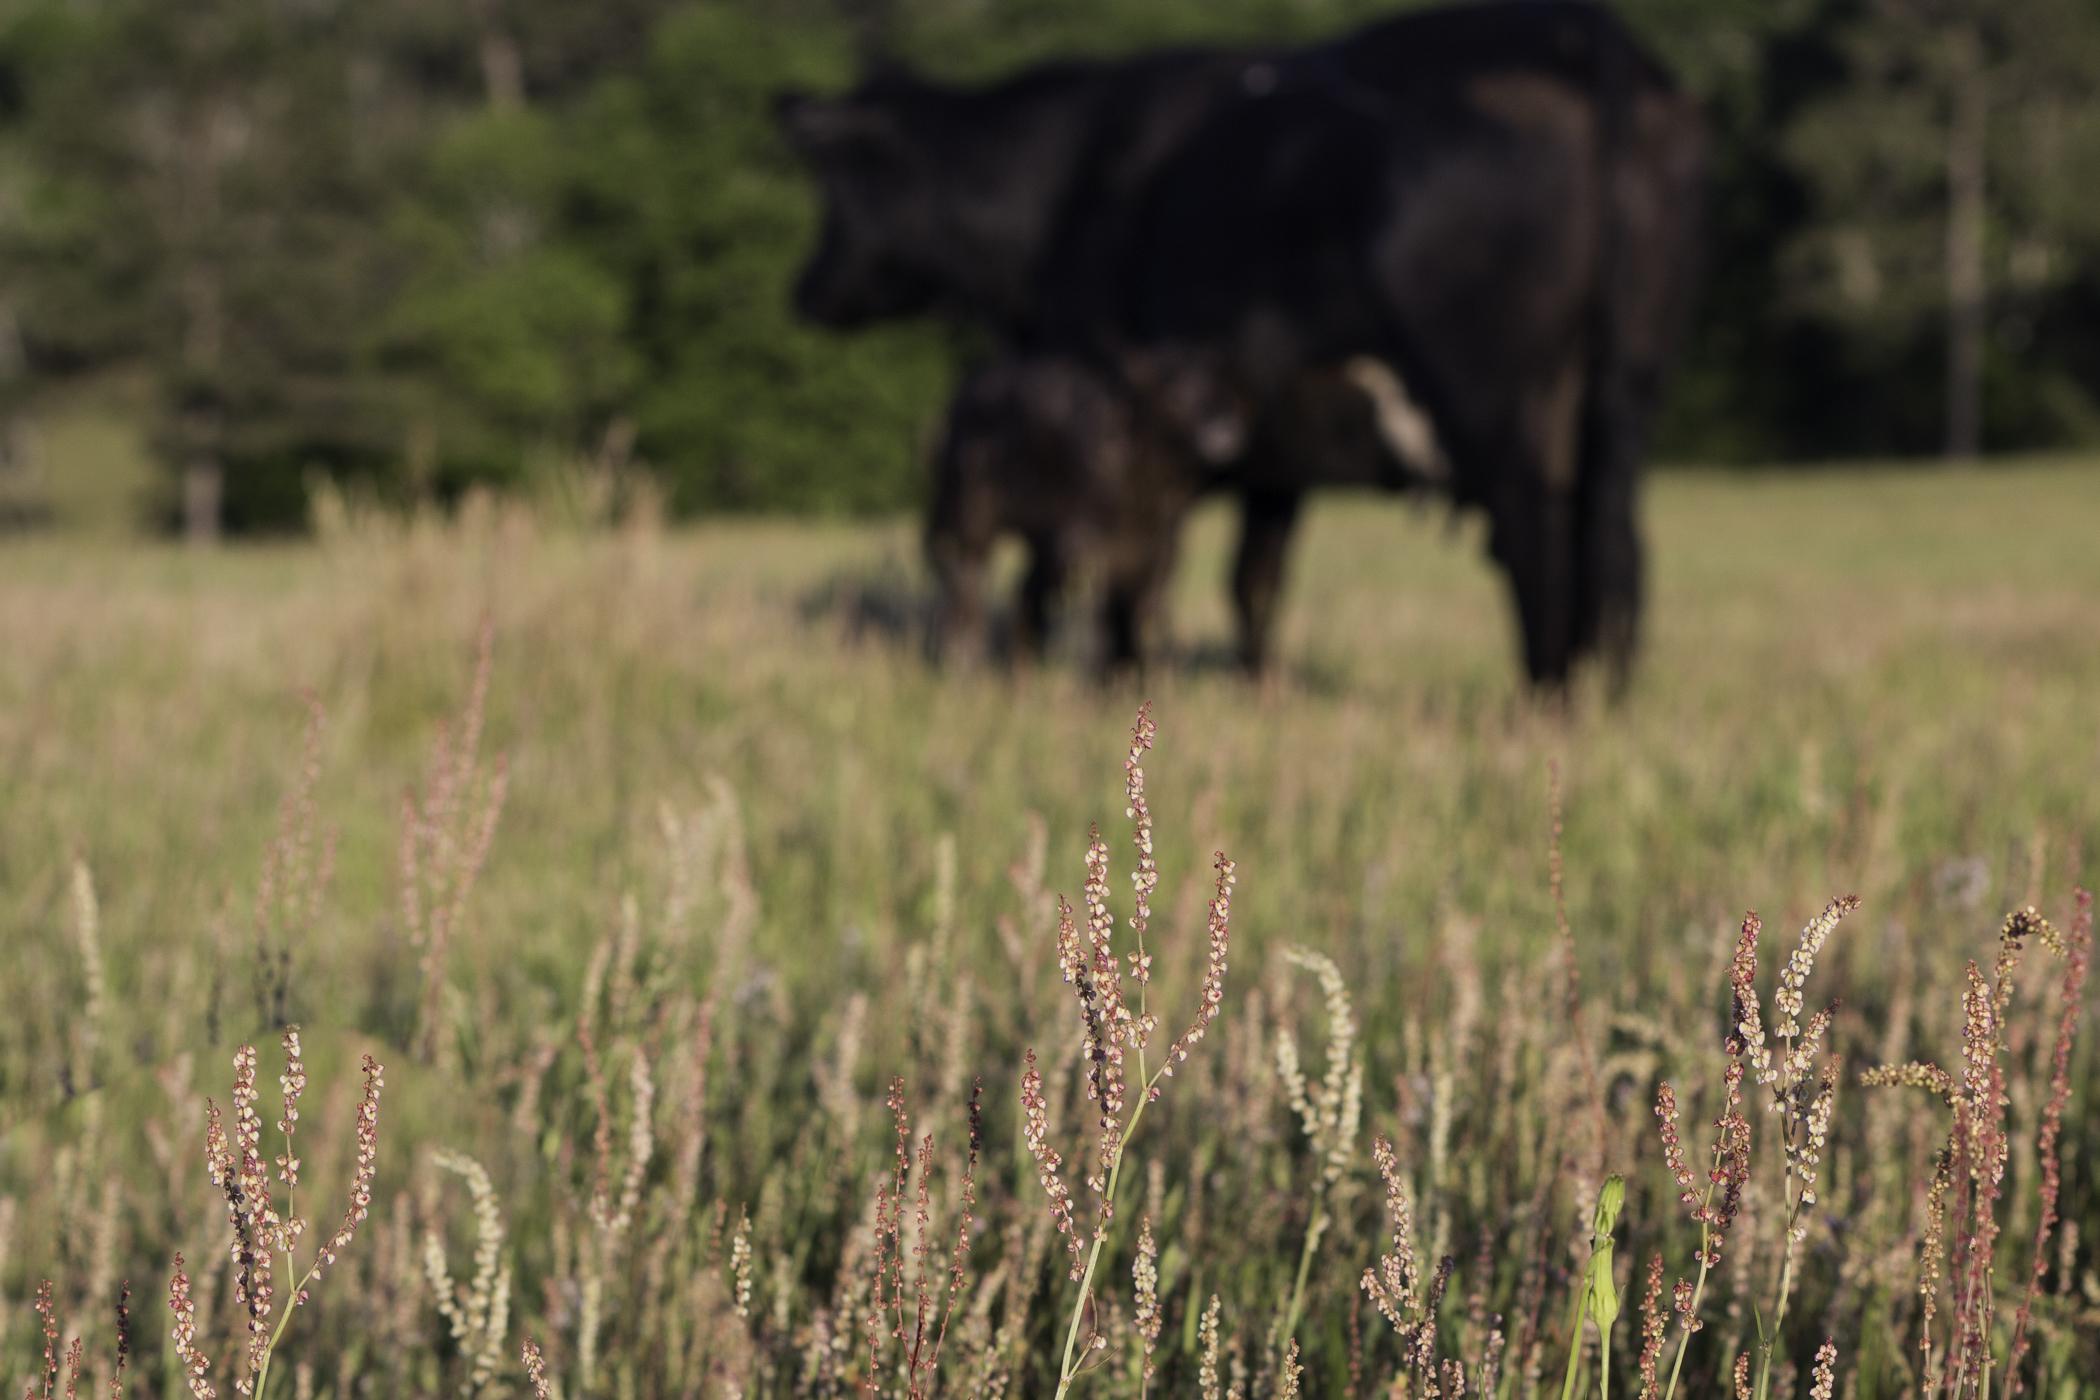 Cows-2.jpg